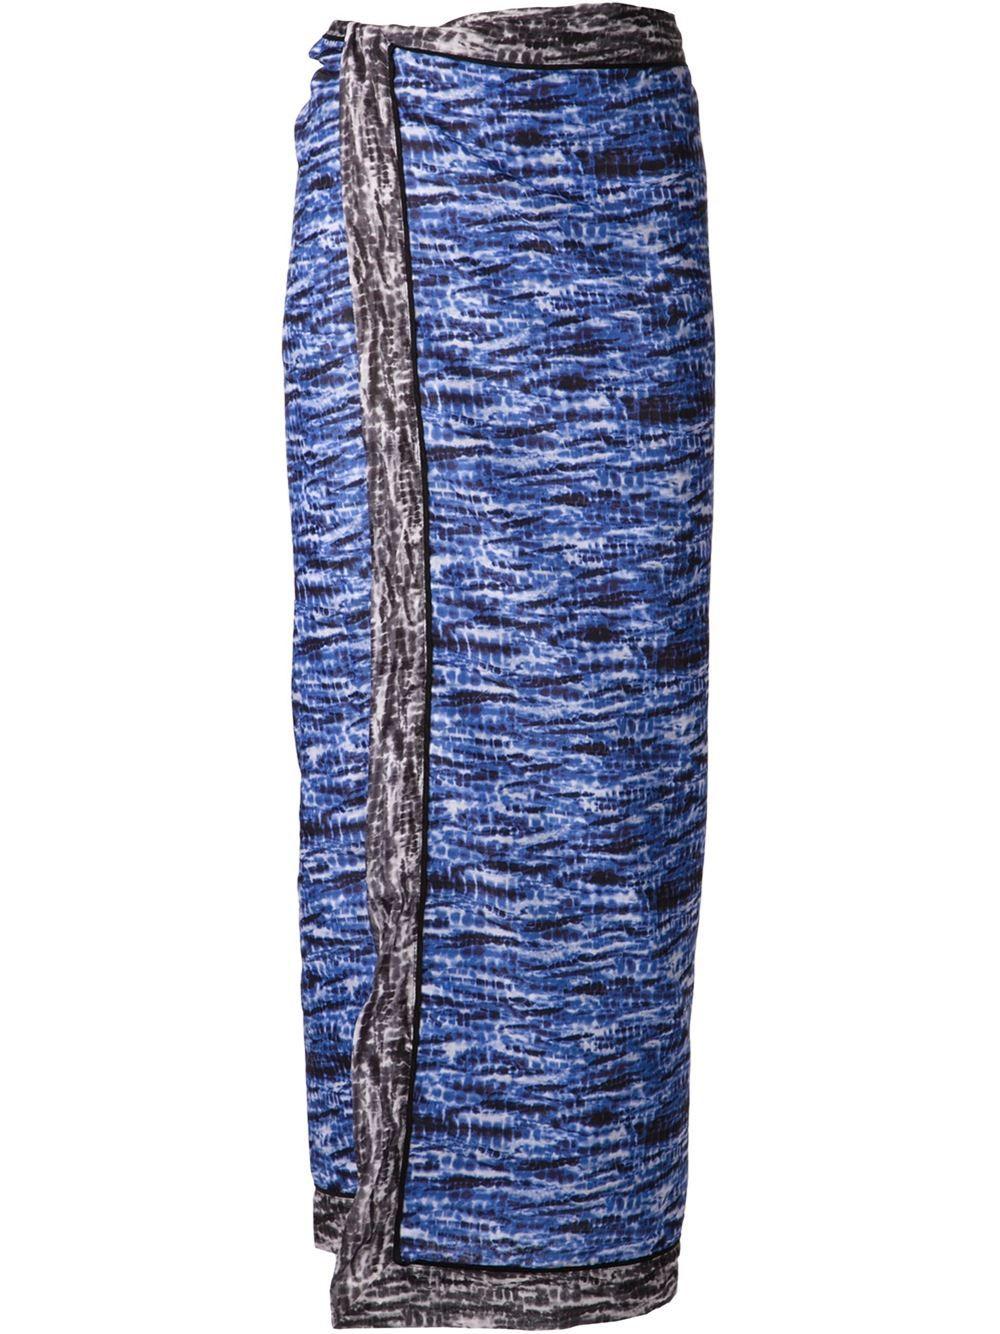 Proenza Schouler Blotchy Print Maxi Skirt - Kirna Zabête - Farfetch.com